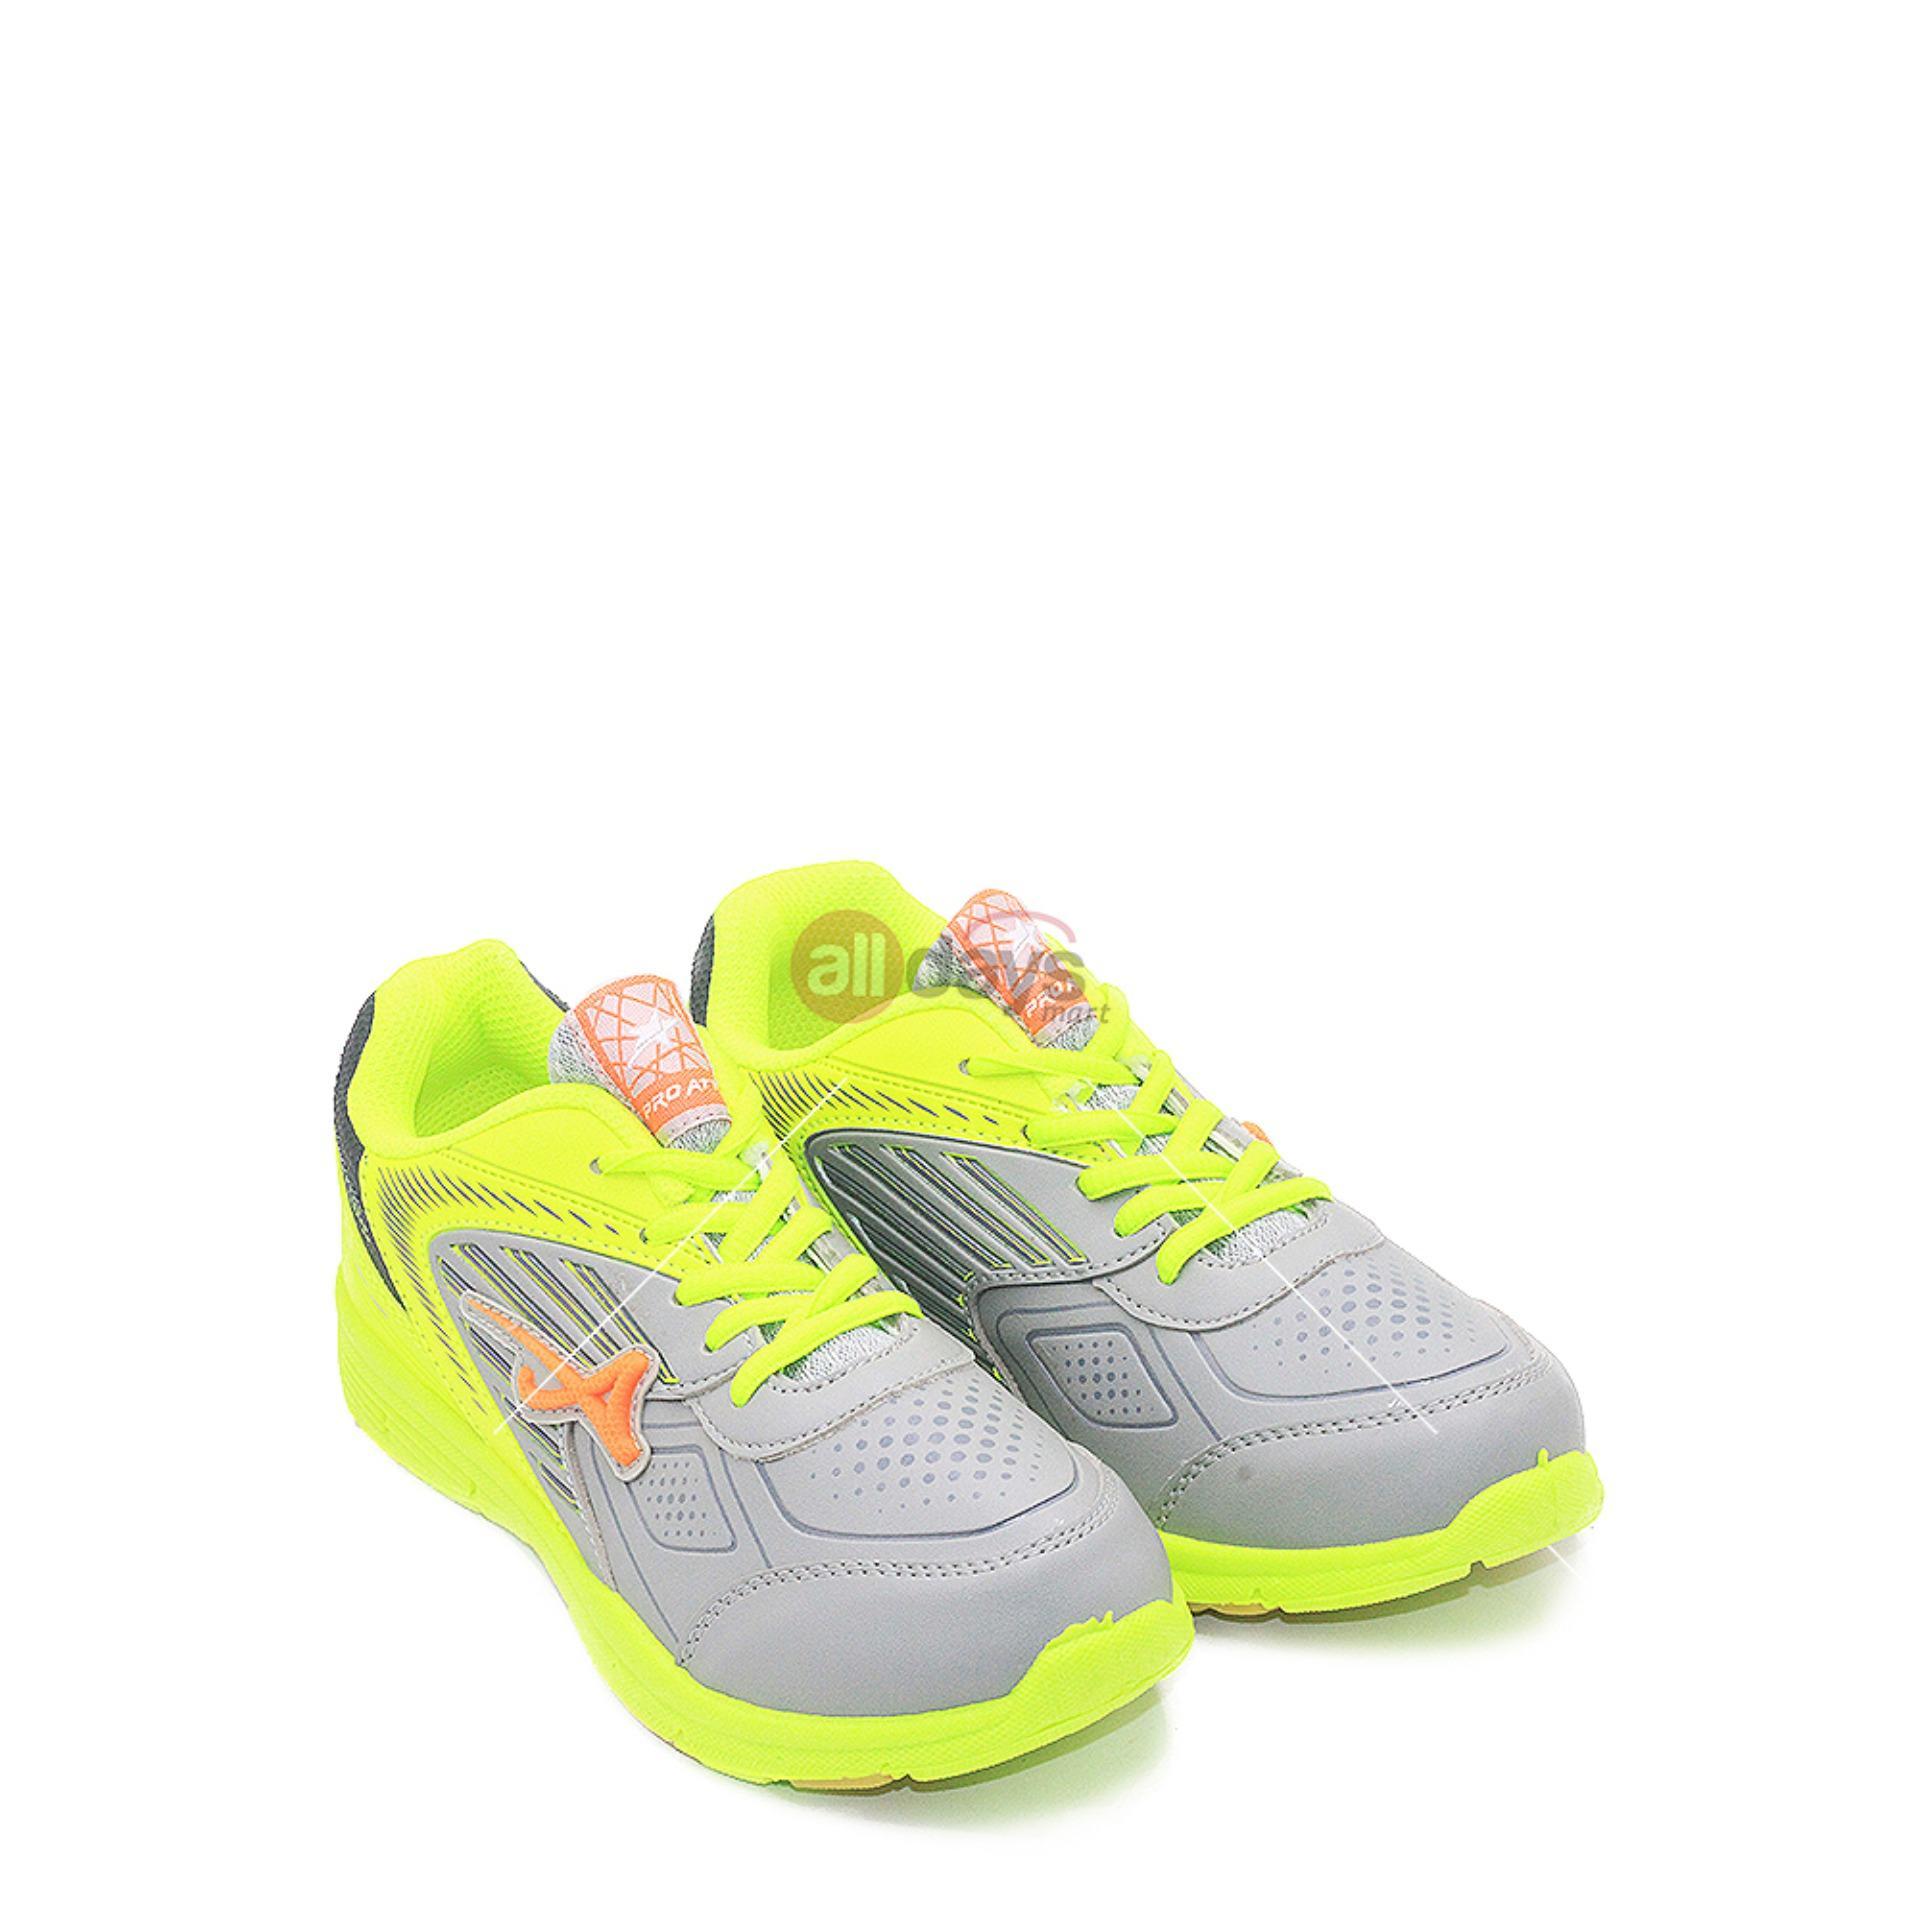 Pro ATT Sepatu Sport Sneakers / Sepatu Lari Kasual dan Sepatu Kets LG 681 - Abuabu